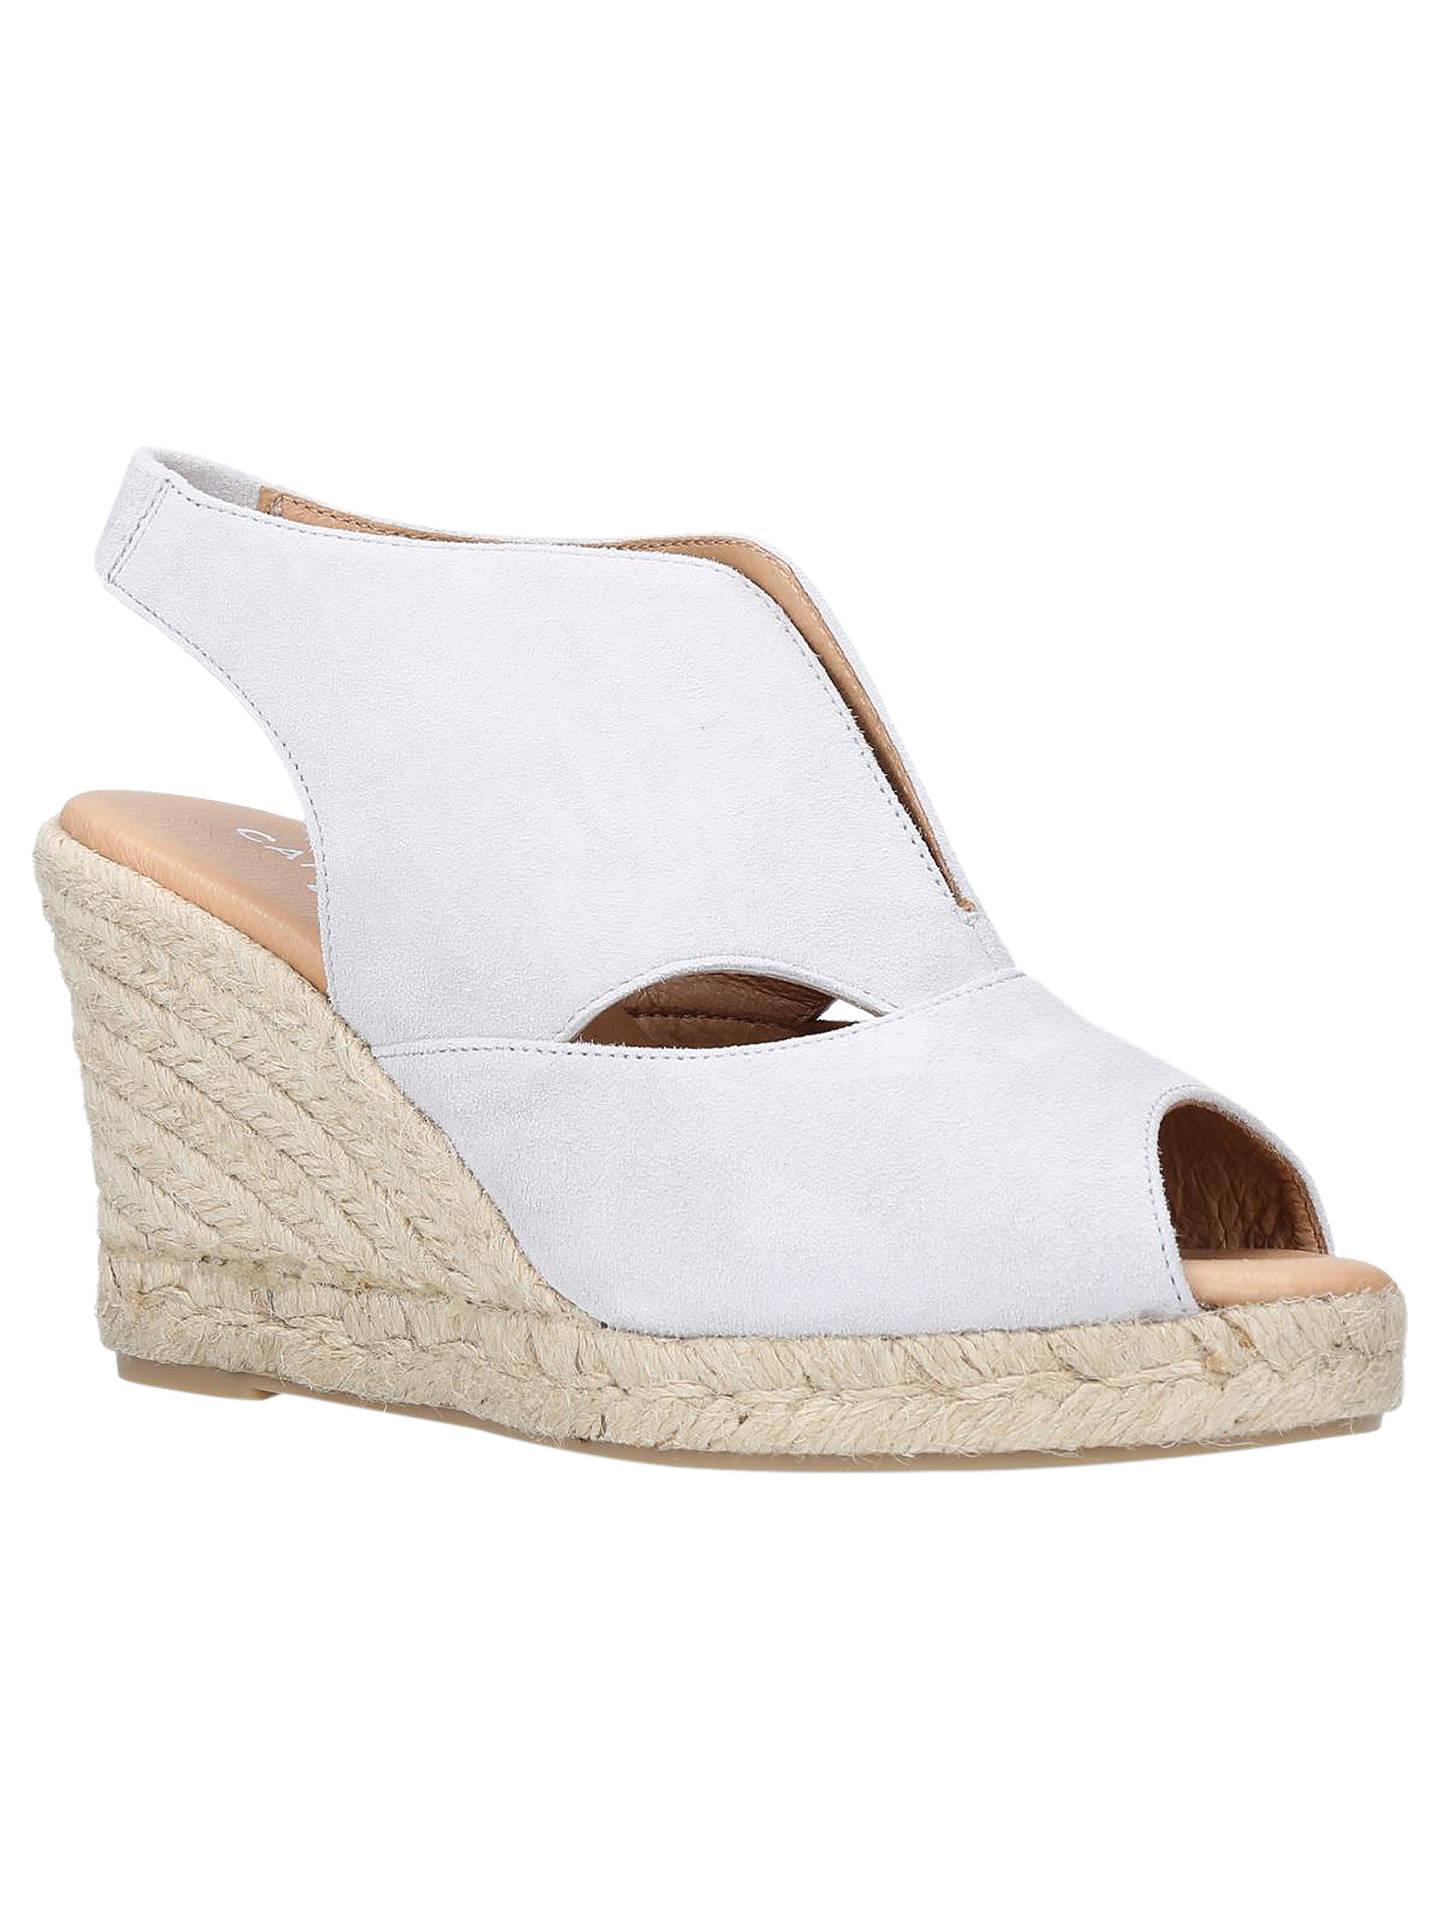 639b86a69313 Buy Carvela Comfort Sara Wedge Heel Sandals